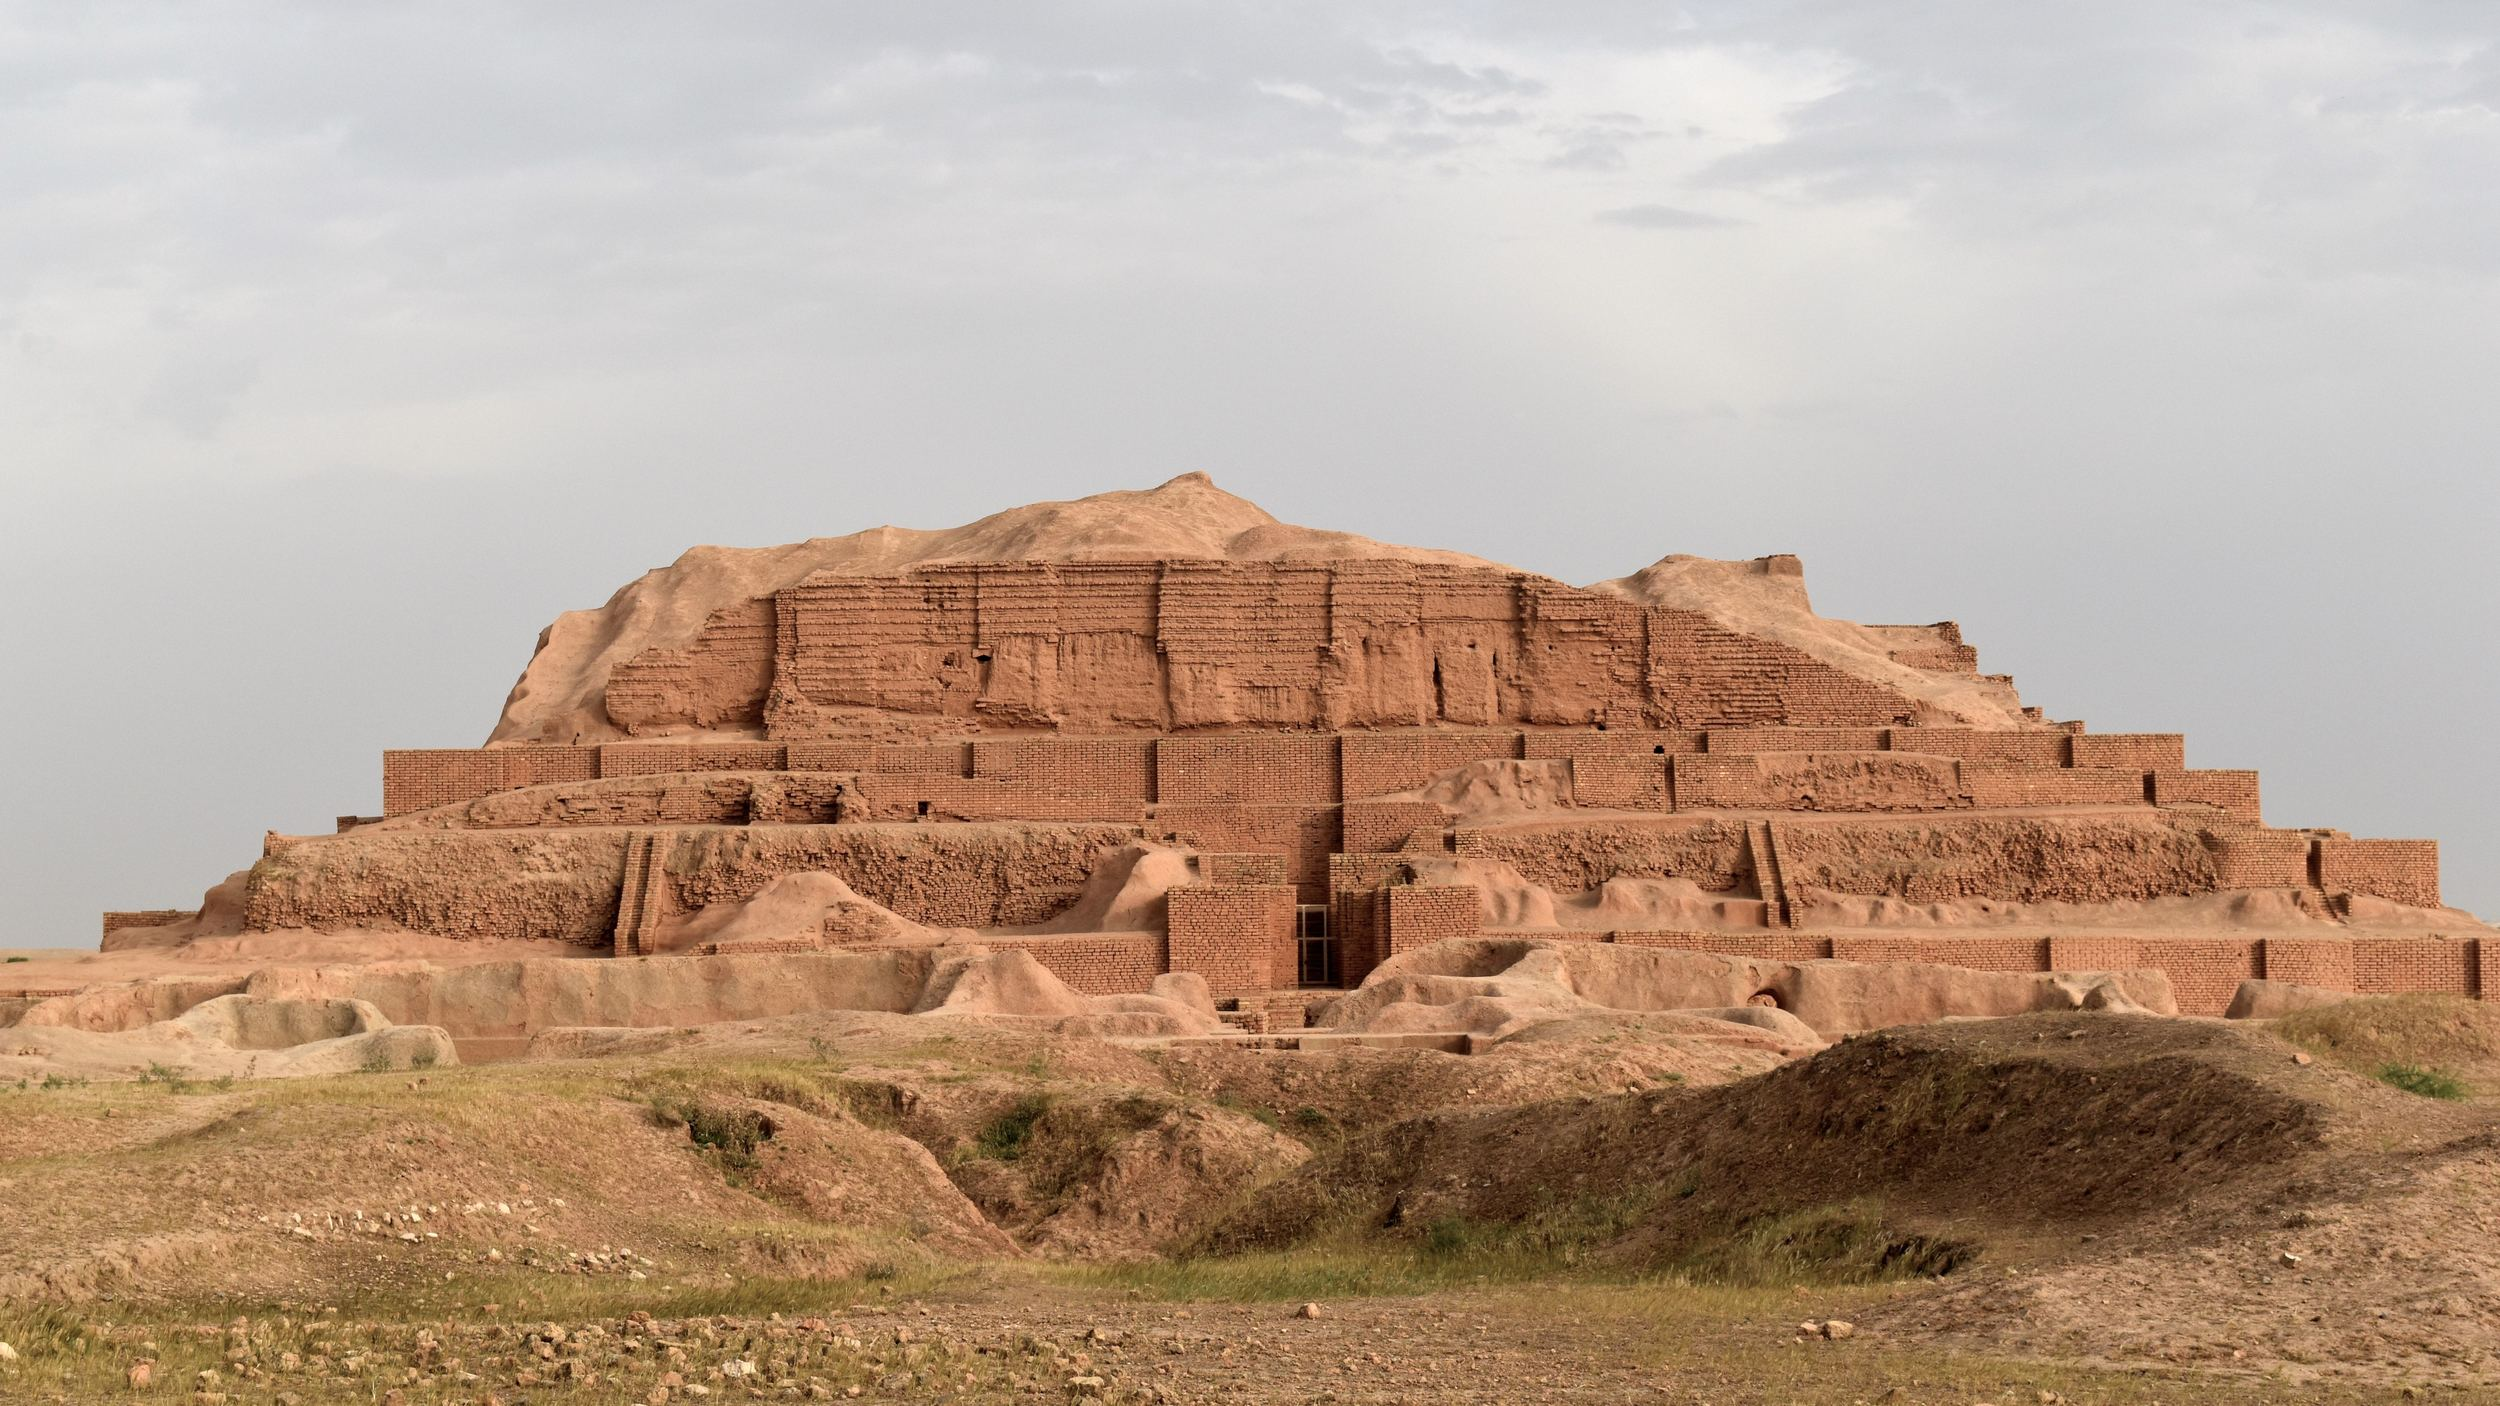 Iran-Chogha-Zanbil-Ziggurat.jpg